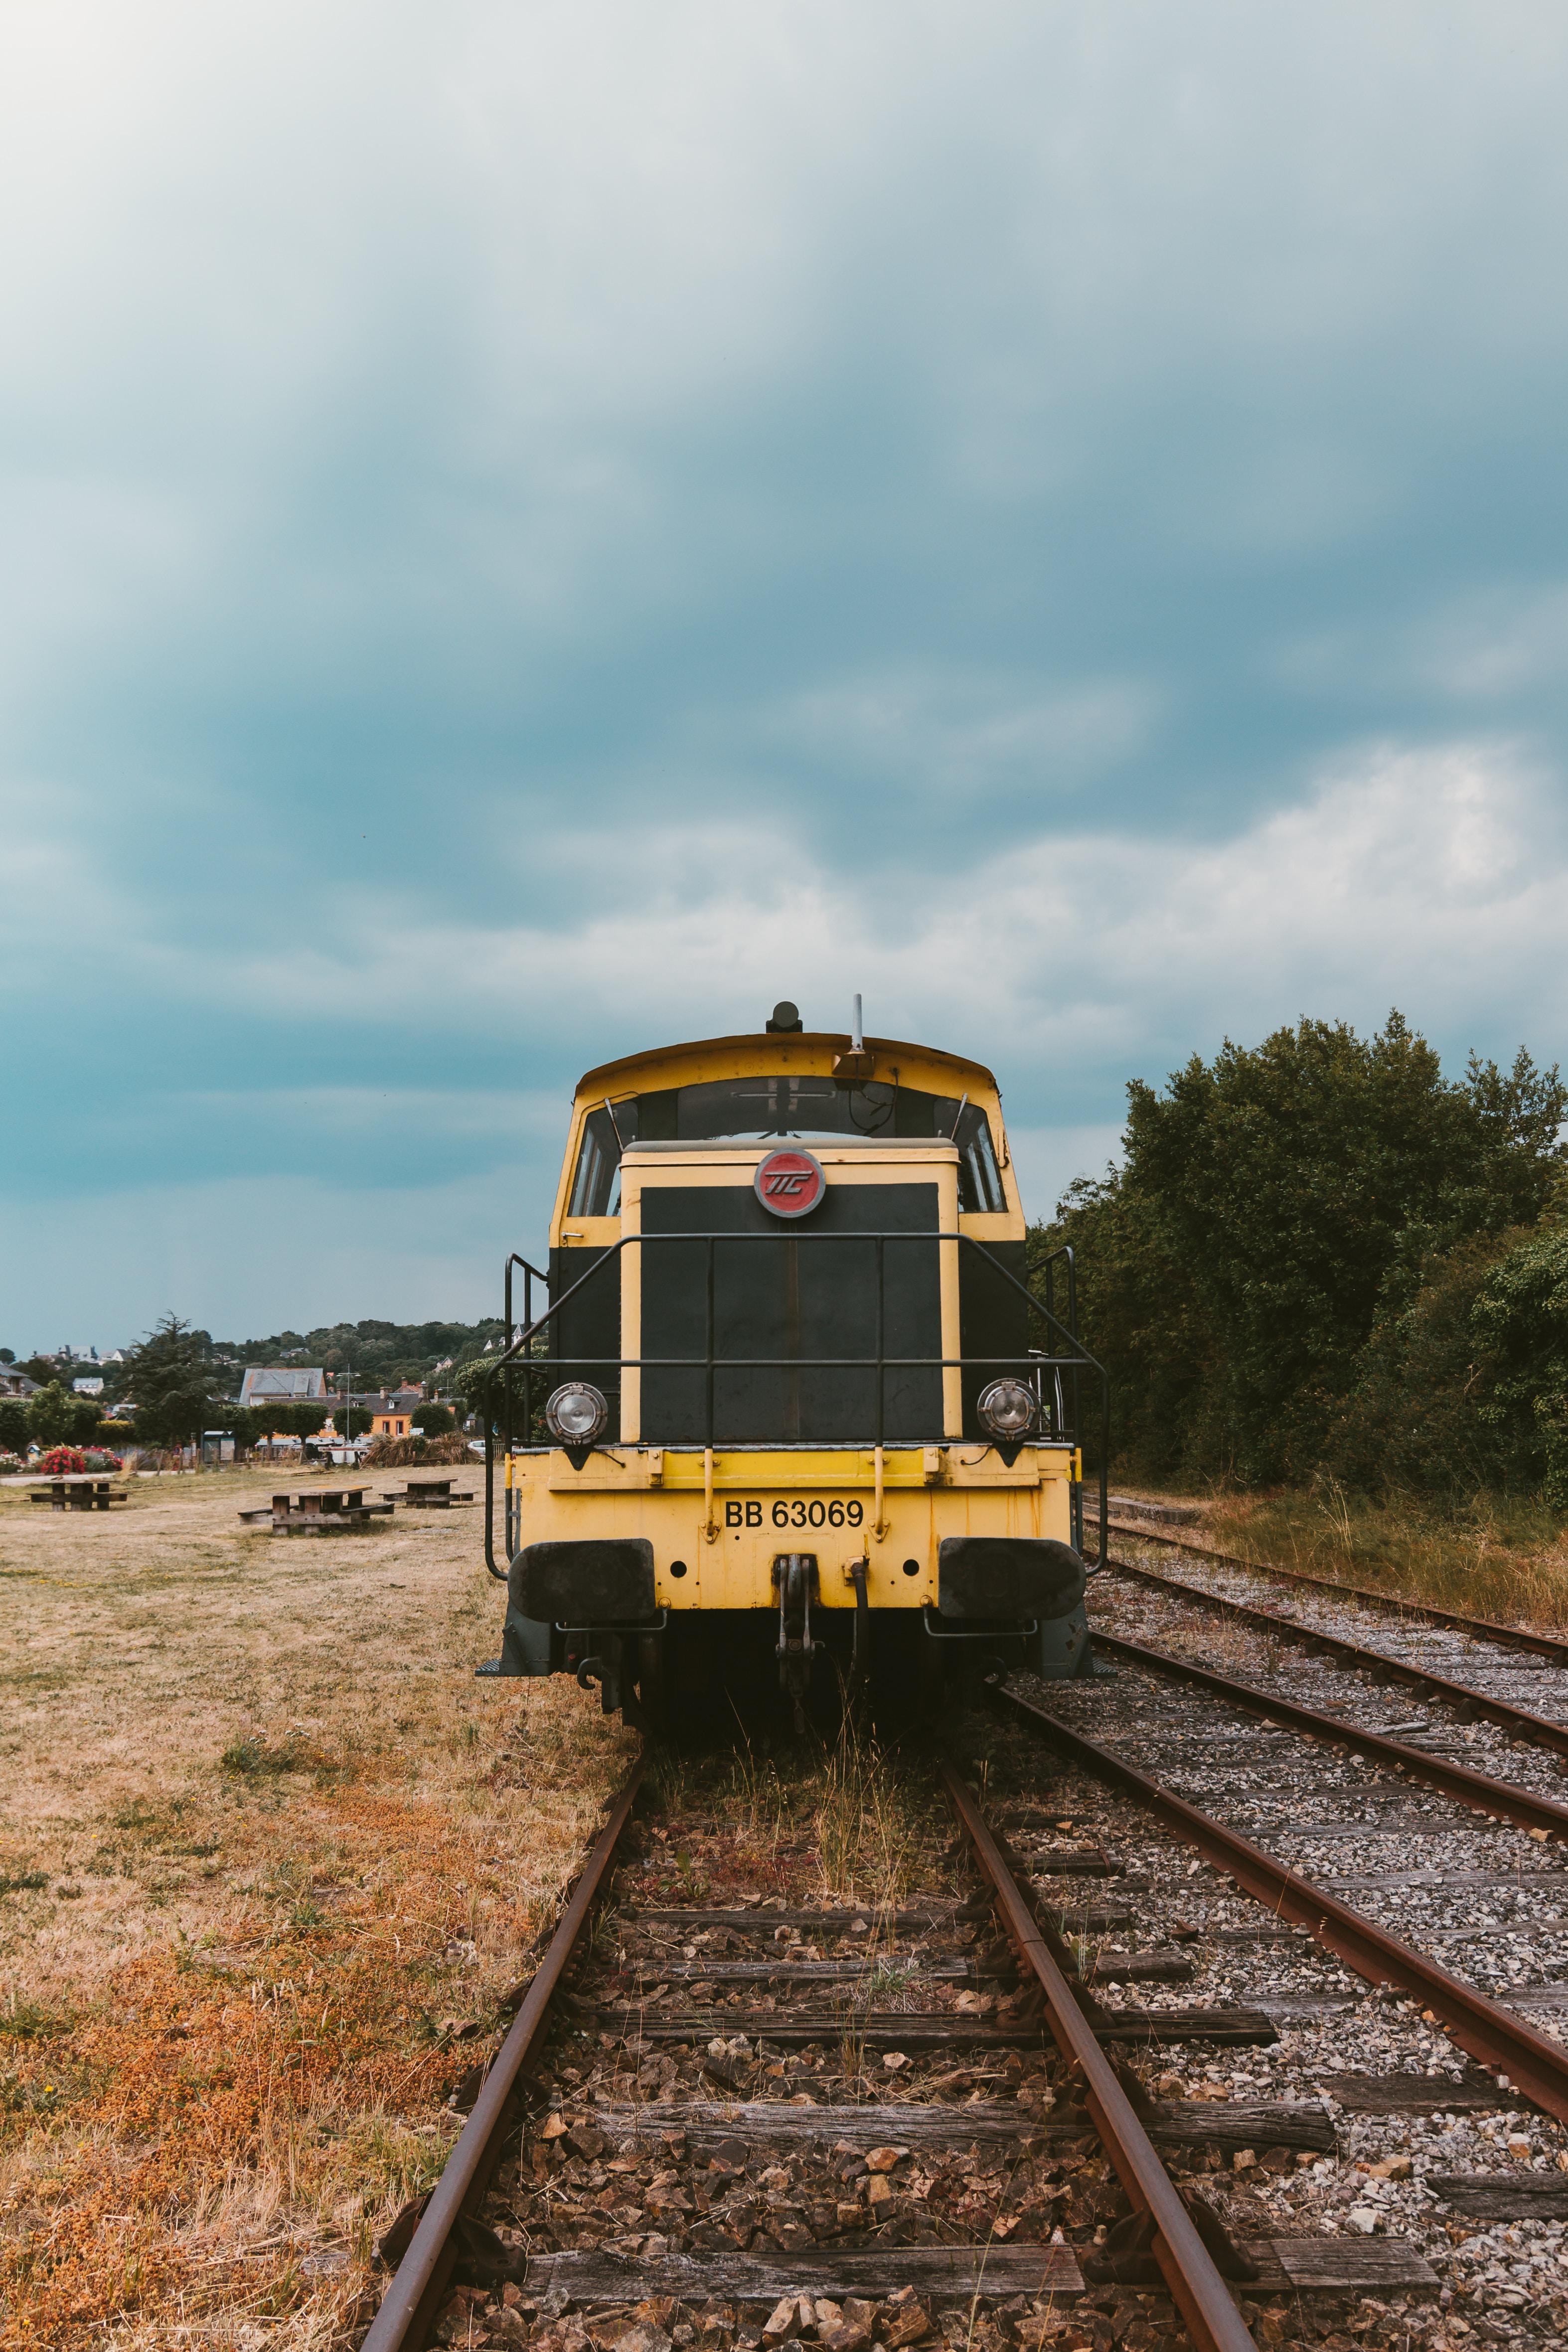 train on railway photo